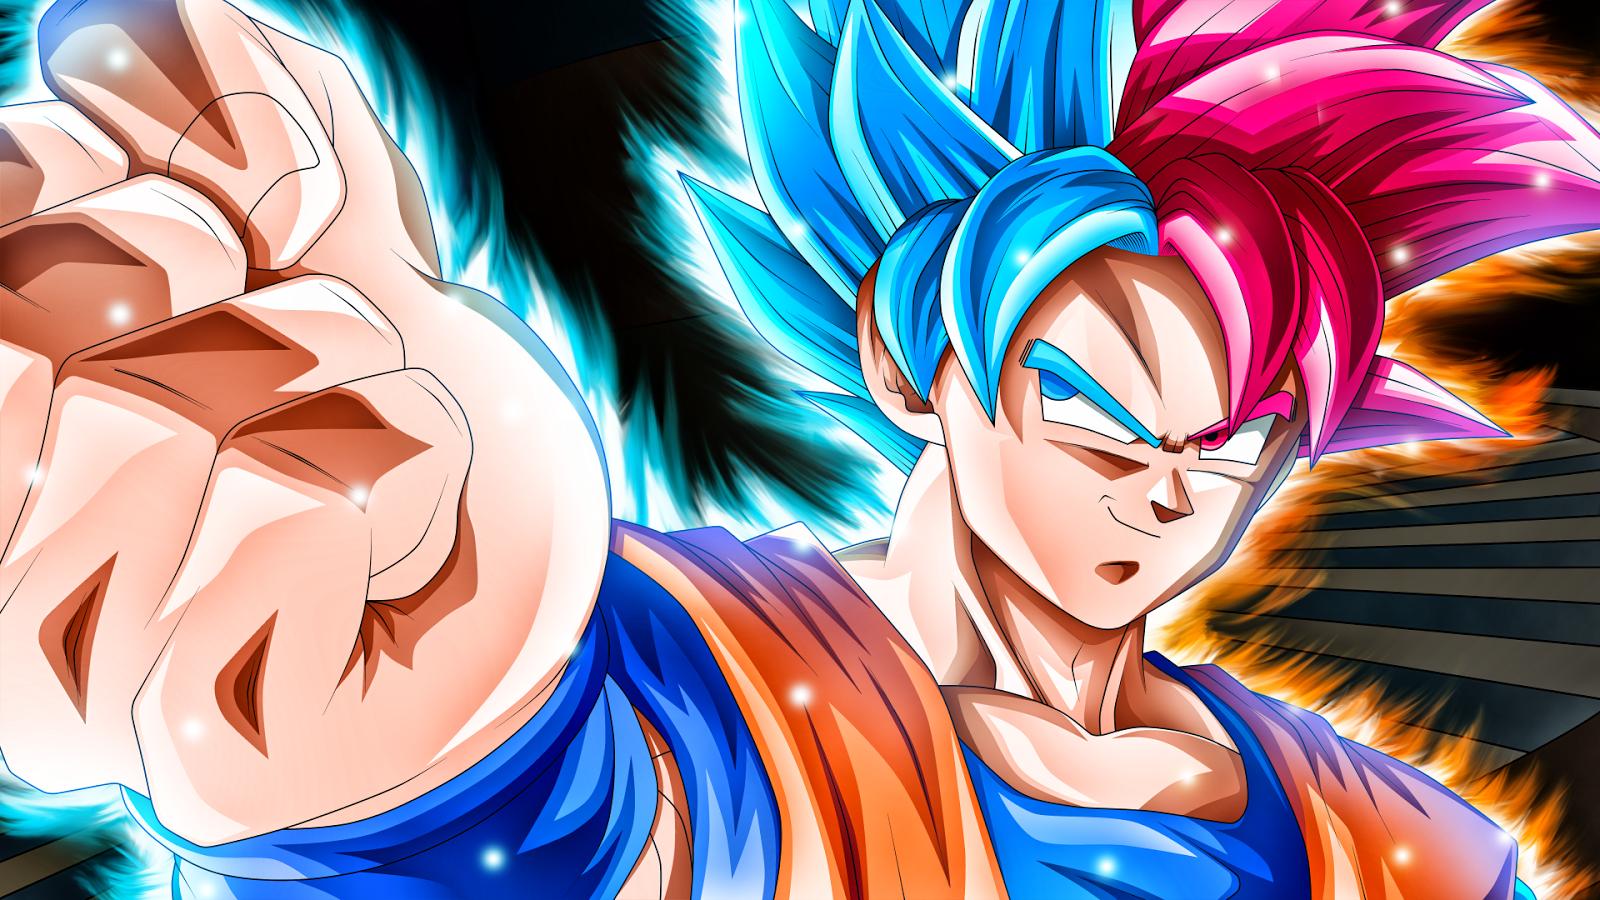 Free Download Son Goku Super Saiyan Blue Wallpaper Images For